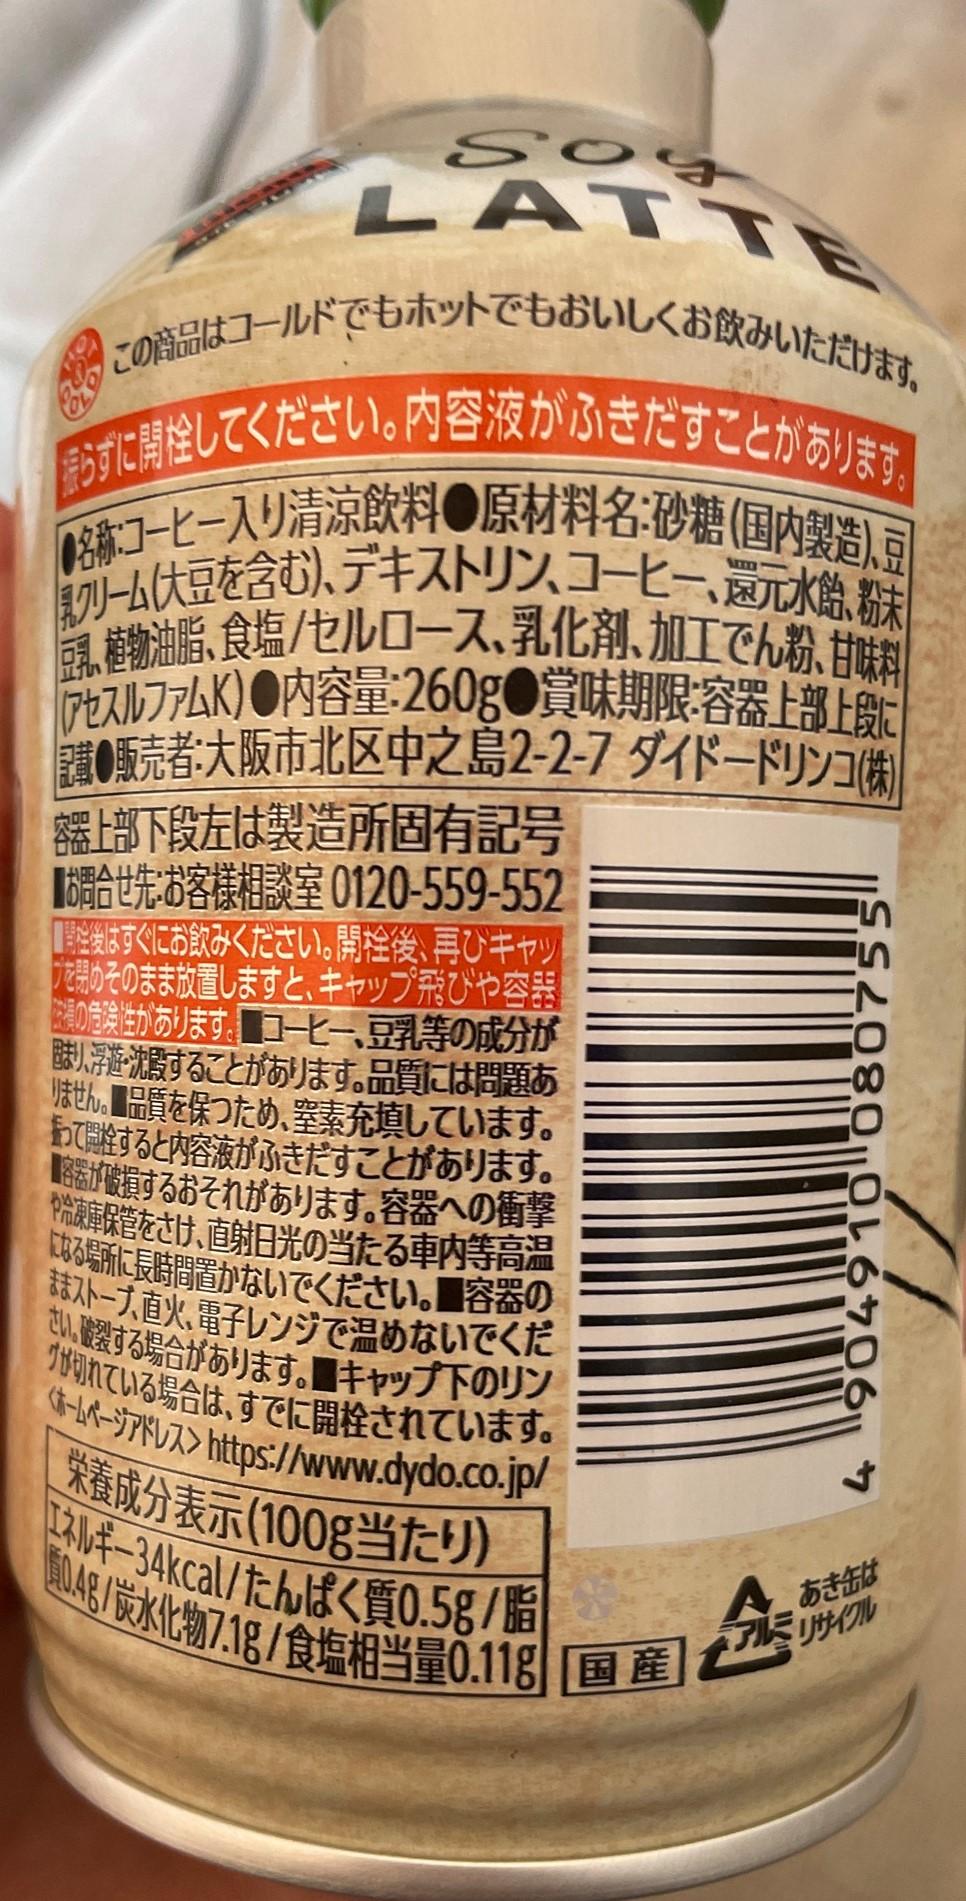 DyDo Blend Soy Latte back of package